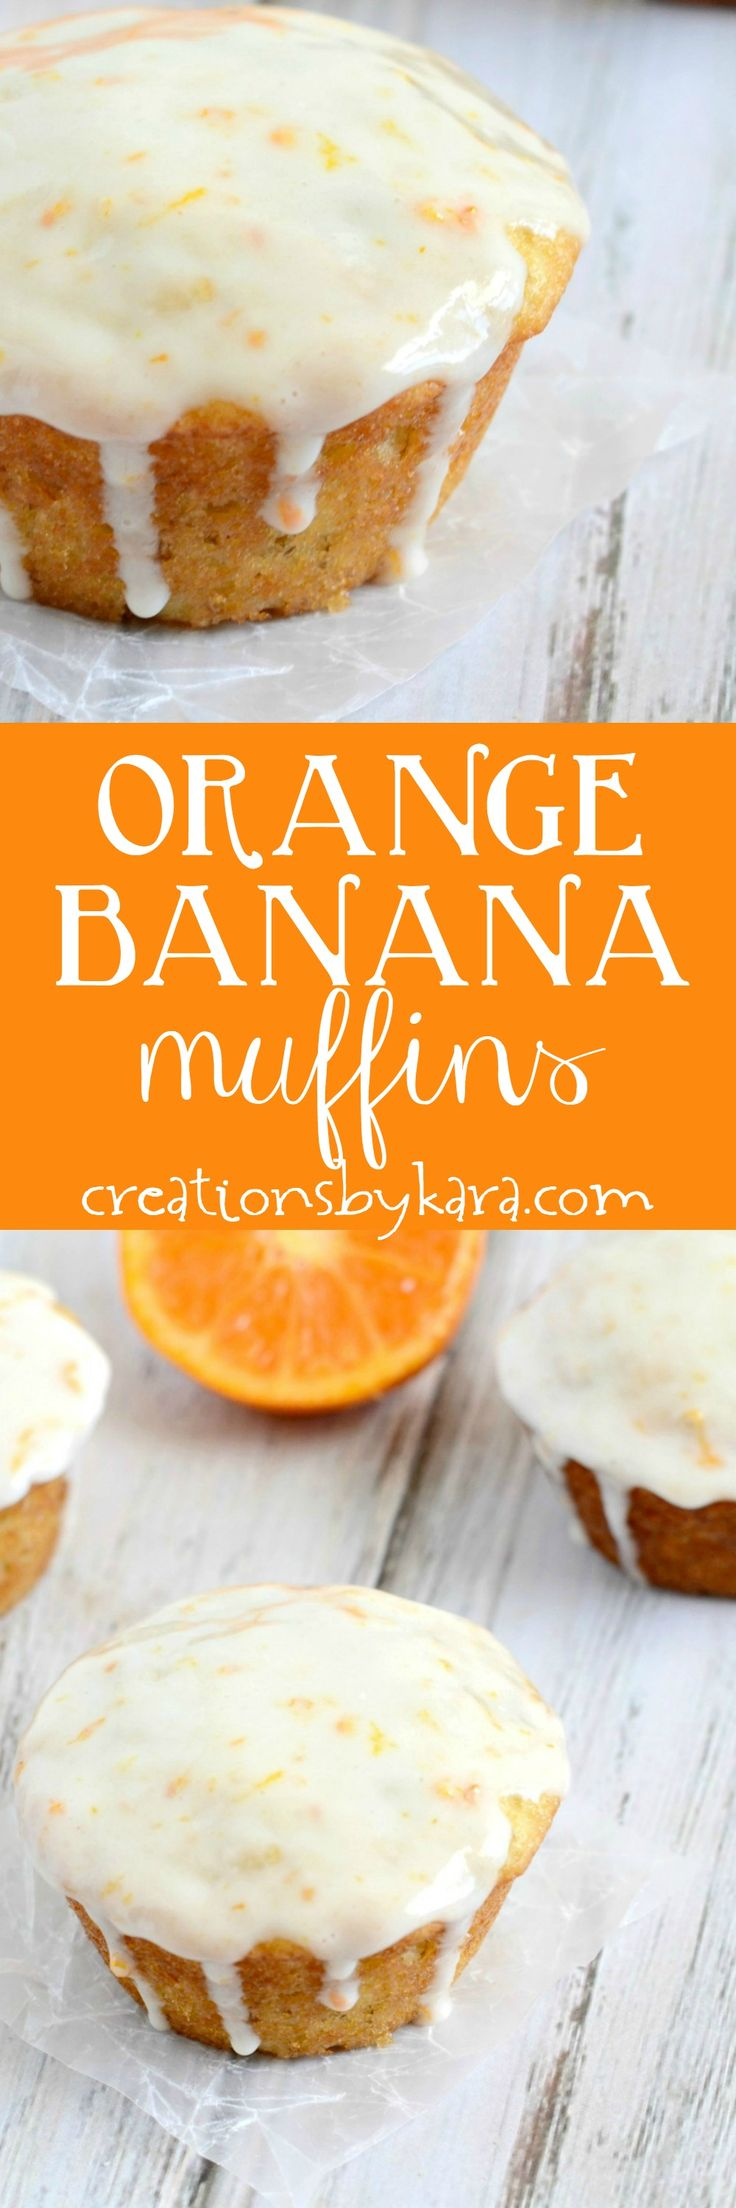 Orange Banana Muffins with Sour Cream Glaze - these banana muffins are far from boring! You will love this muffin recipe.  via @creationsbykara.com